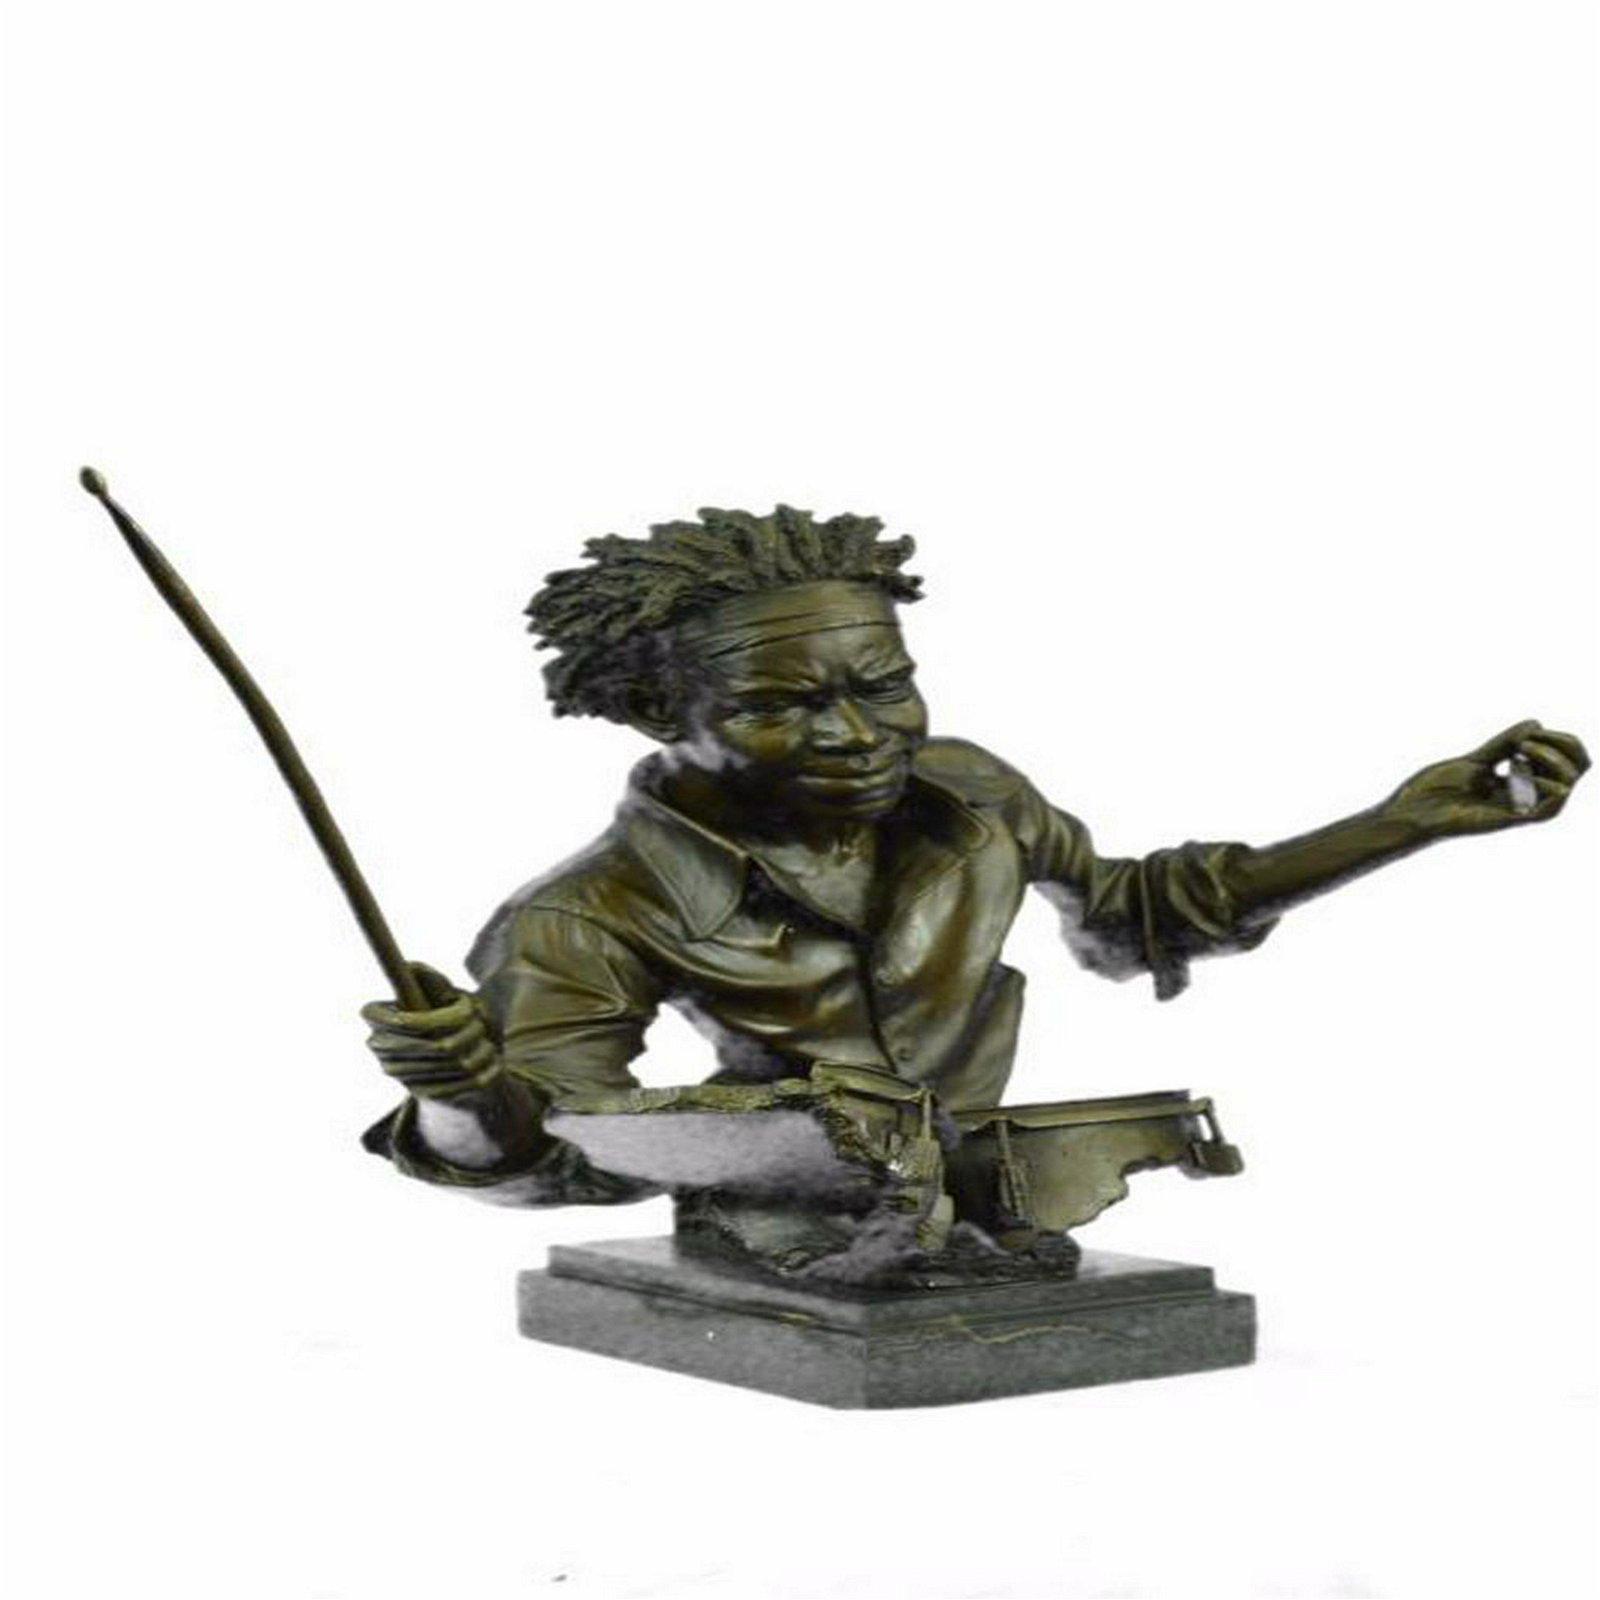 Bronze Drum Set Figurine on Marble Base Statue